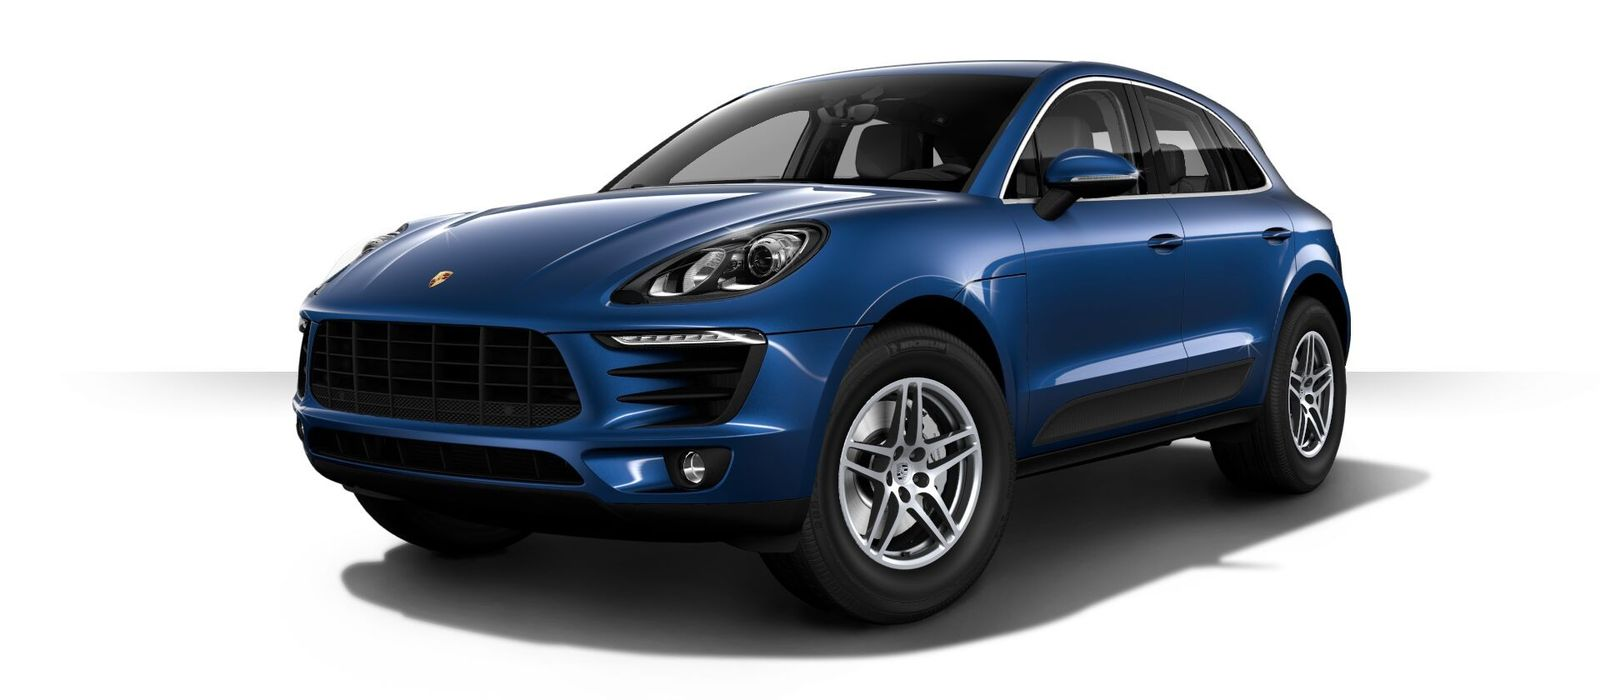 Porsche Macan colour guide and prices 2015 | carwow on porsche cayenne paint colors, porsche 911 turbo light blue color, porsche paint color chart,